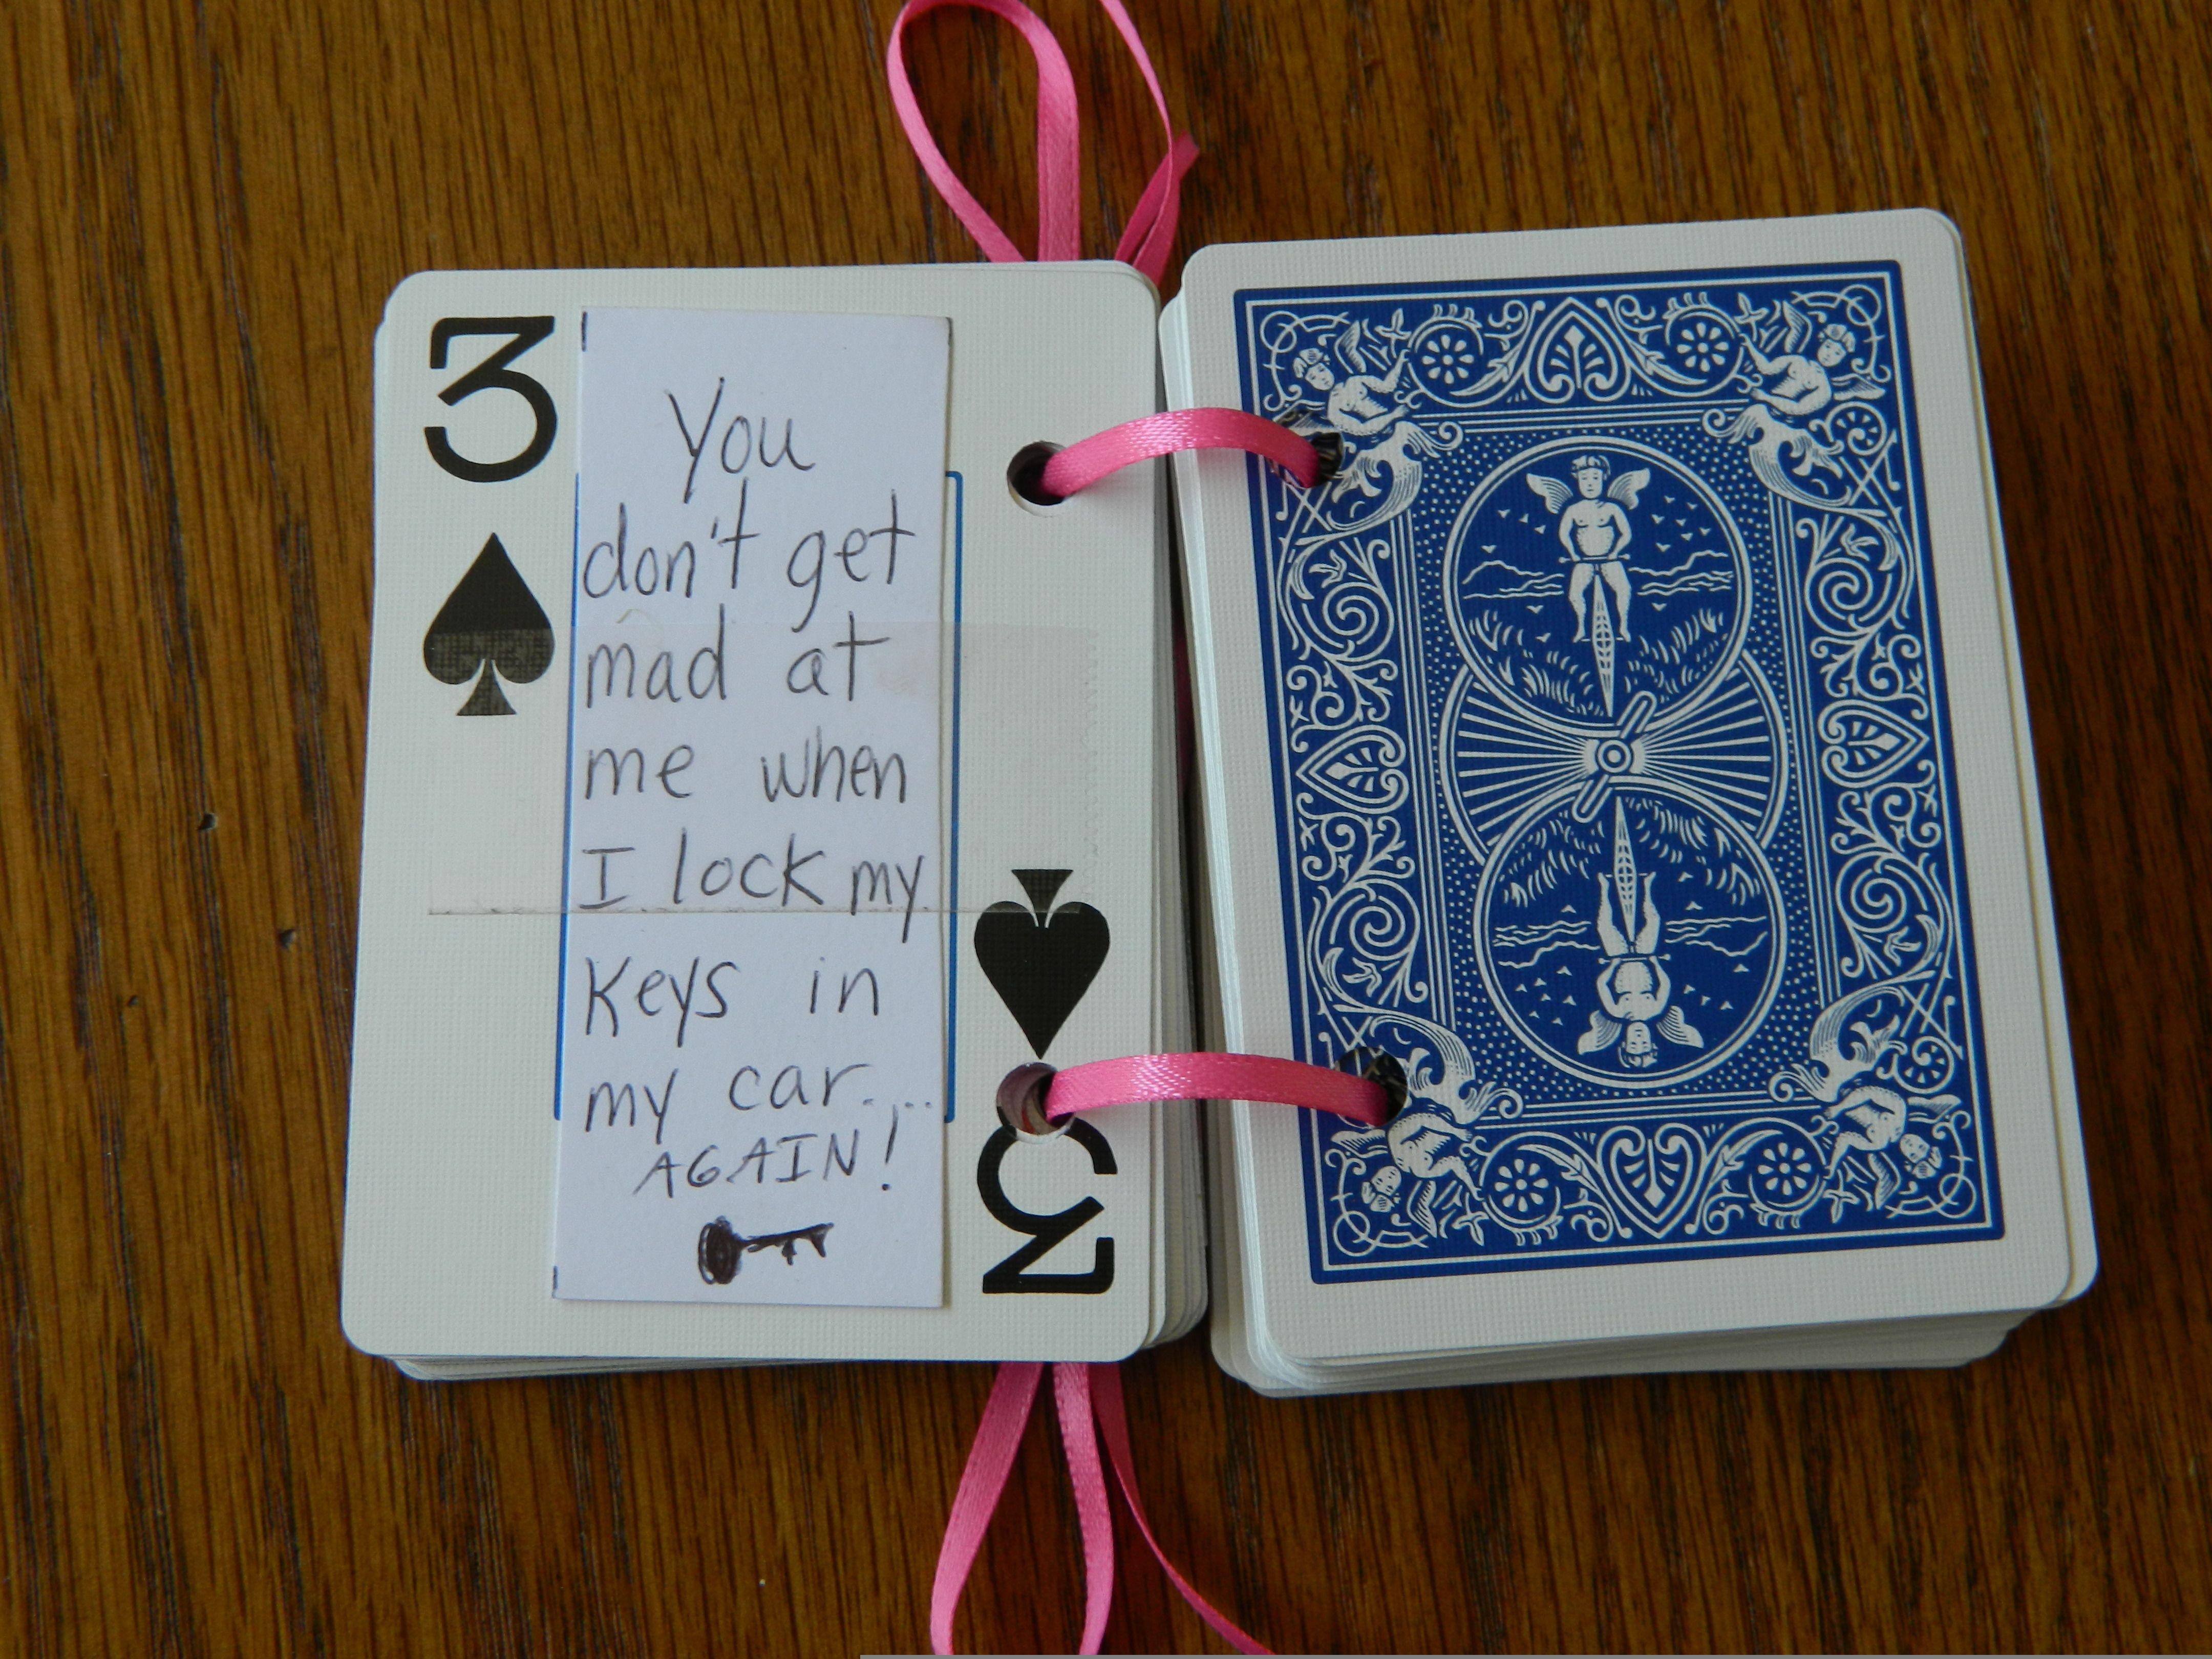 Gift Ideas for Boyfriend Sentimental Birthday Gift Ideas